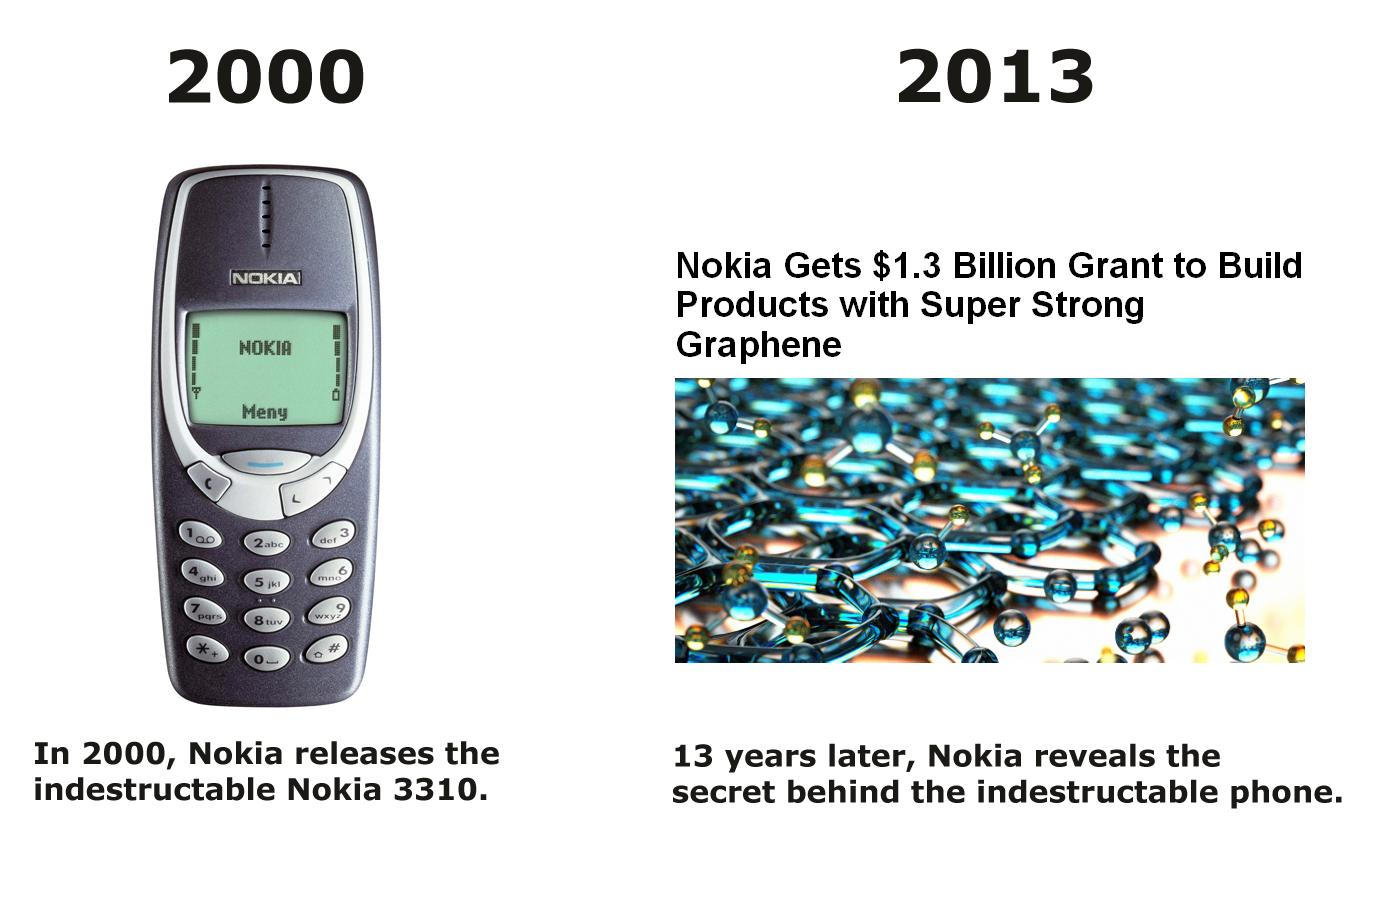 ff4 the secret behind nokia indestructible nokia 3310 know your meme